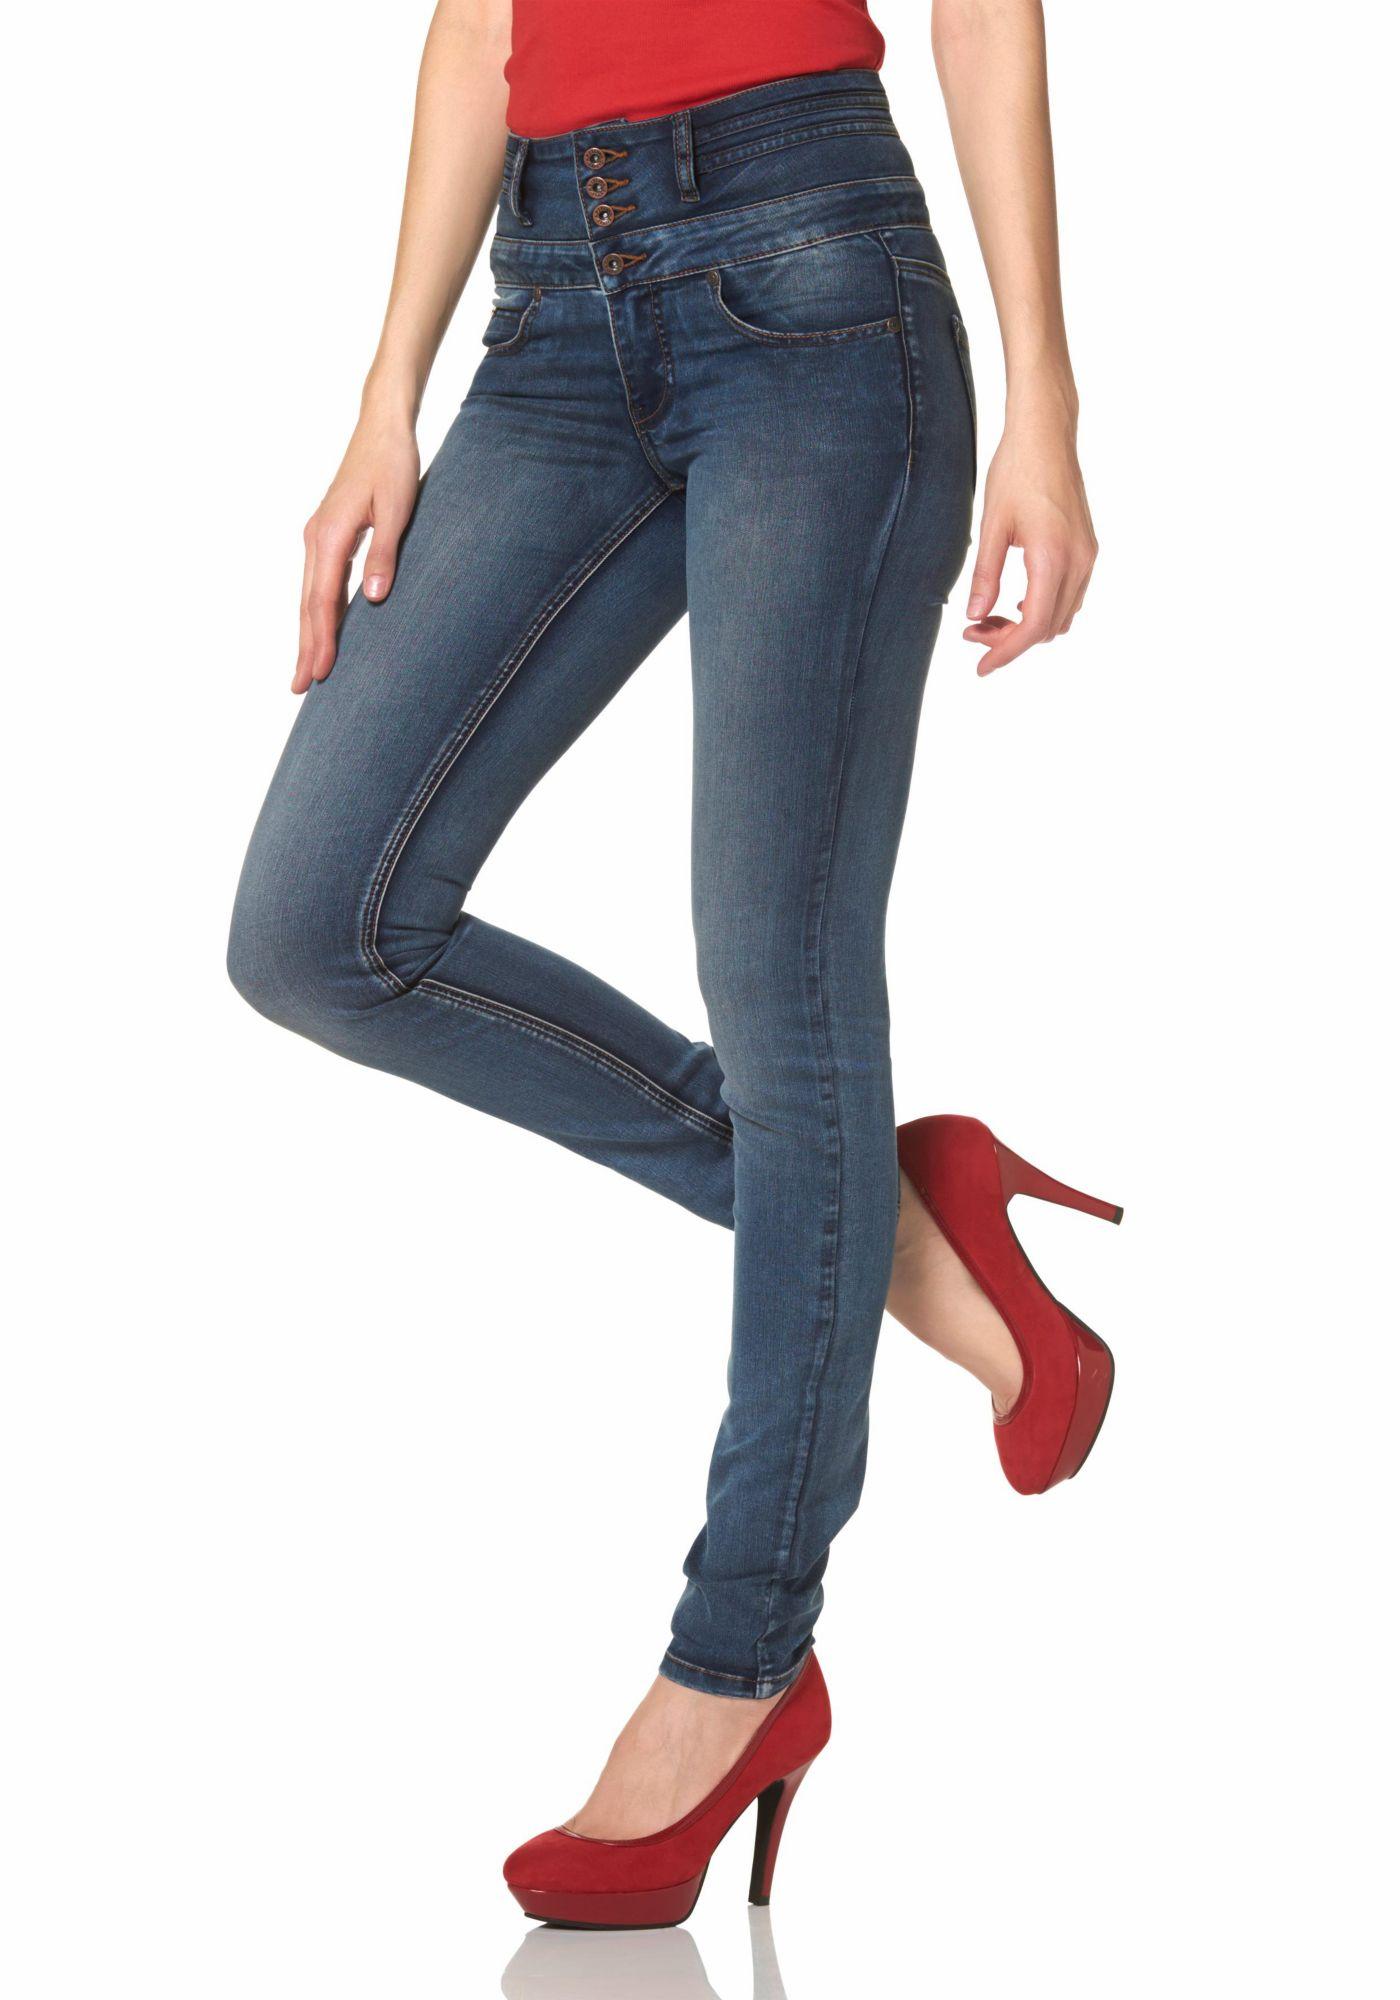 arizona skinny fit jeans mit gummizug einsatz schwab. Black Bedroom Furniture Sets. Home Design Ideas